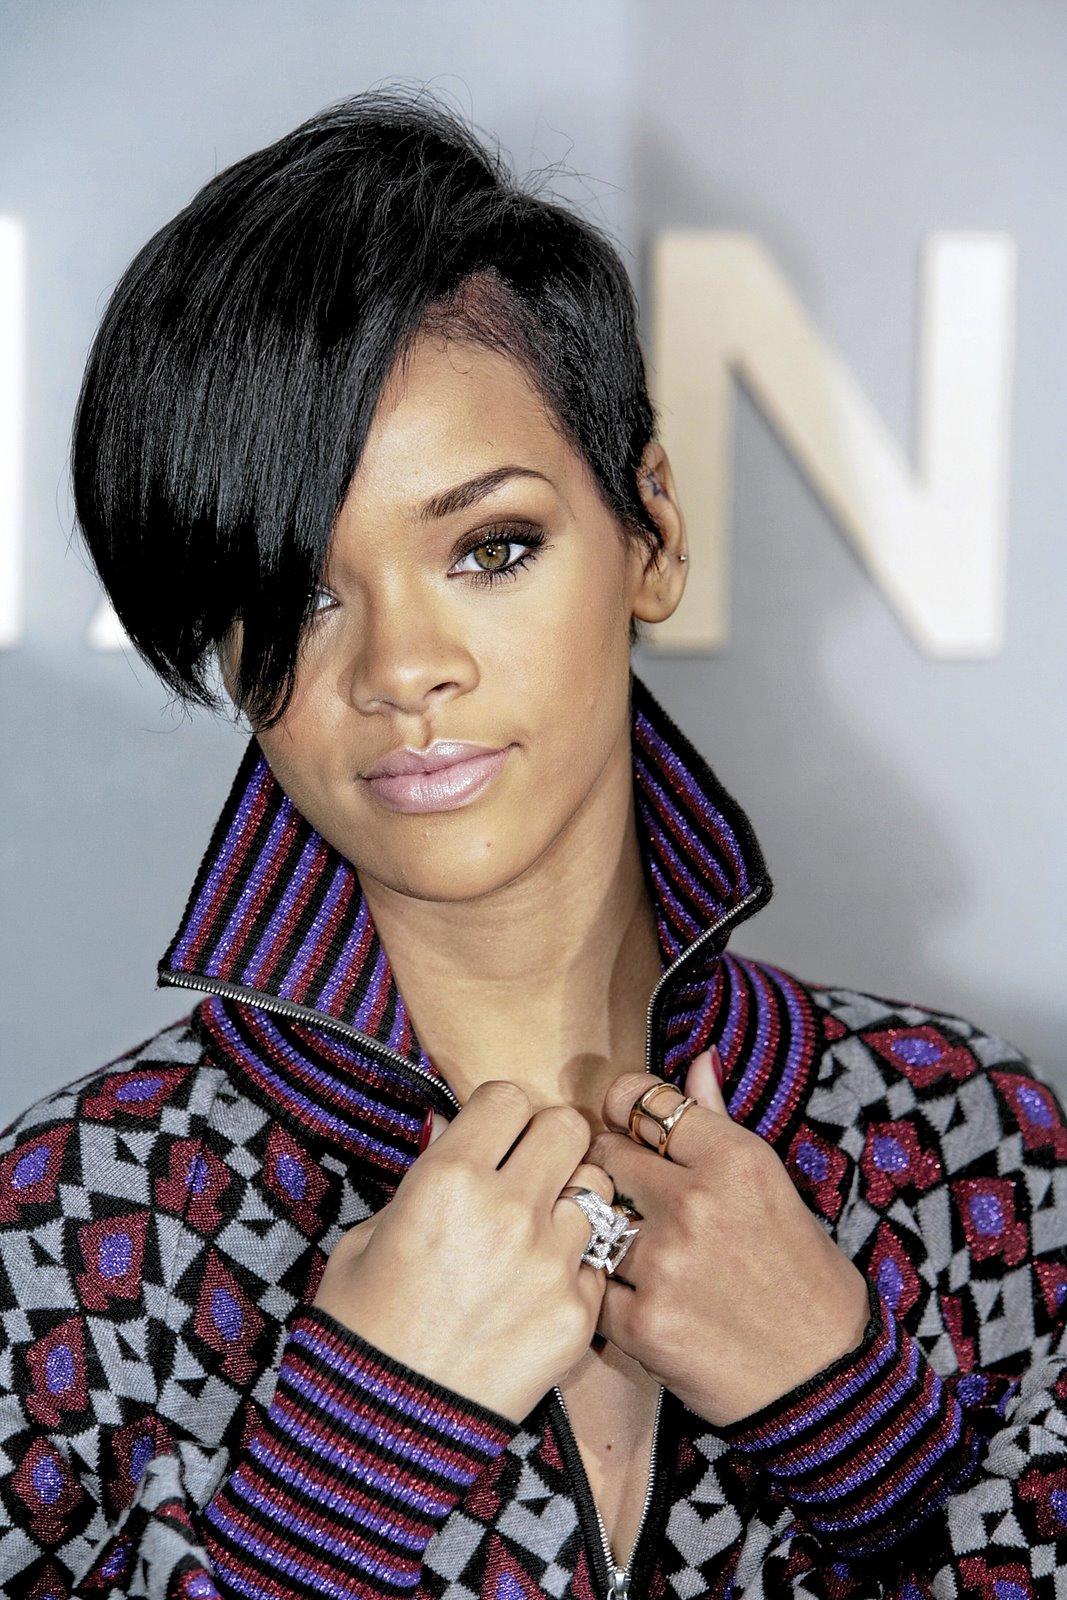 Magnificent Short Cut Hairstyles Black Women Short Hairstyles For Women And Man Short Hairstyles For Black Women Fulllsitofus